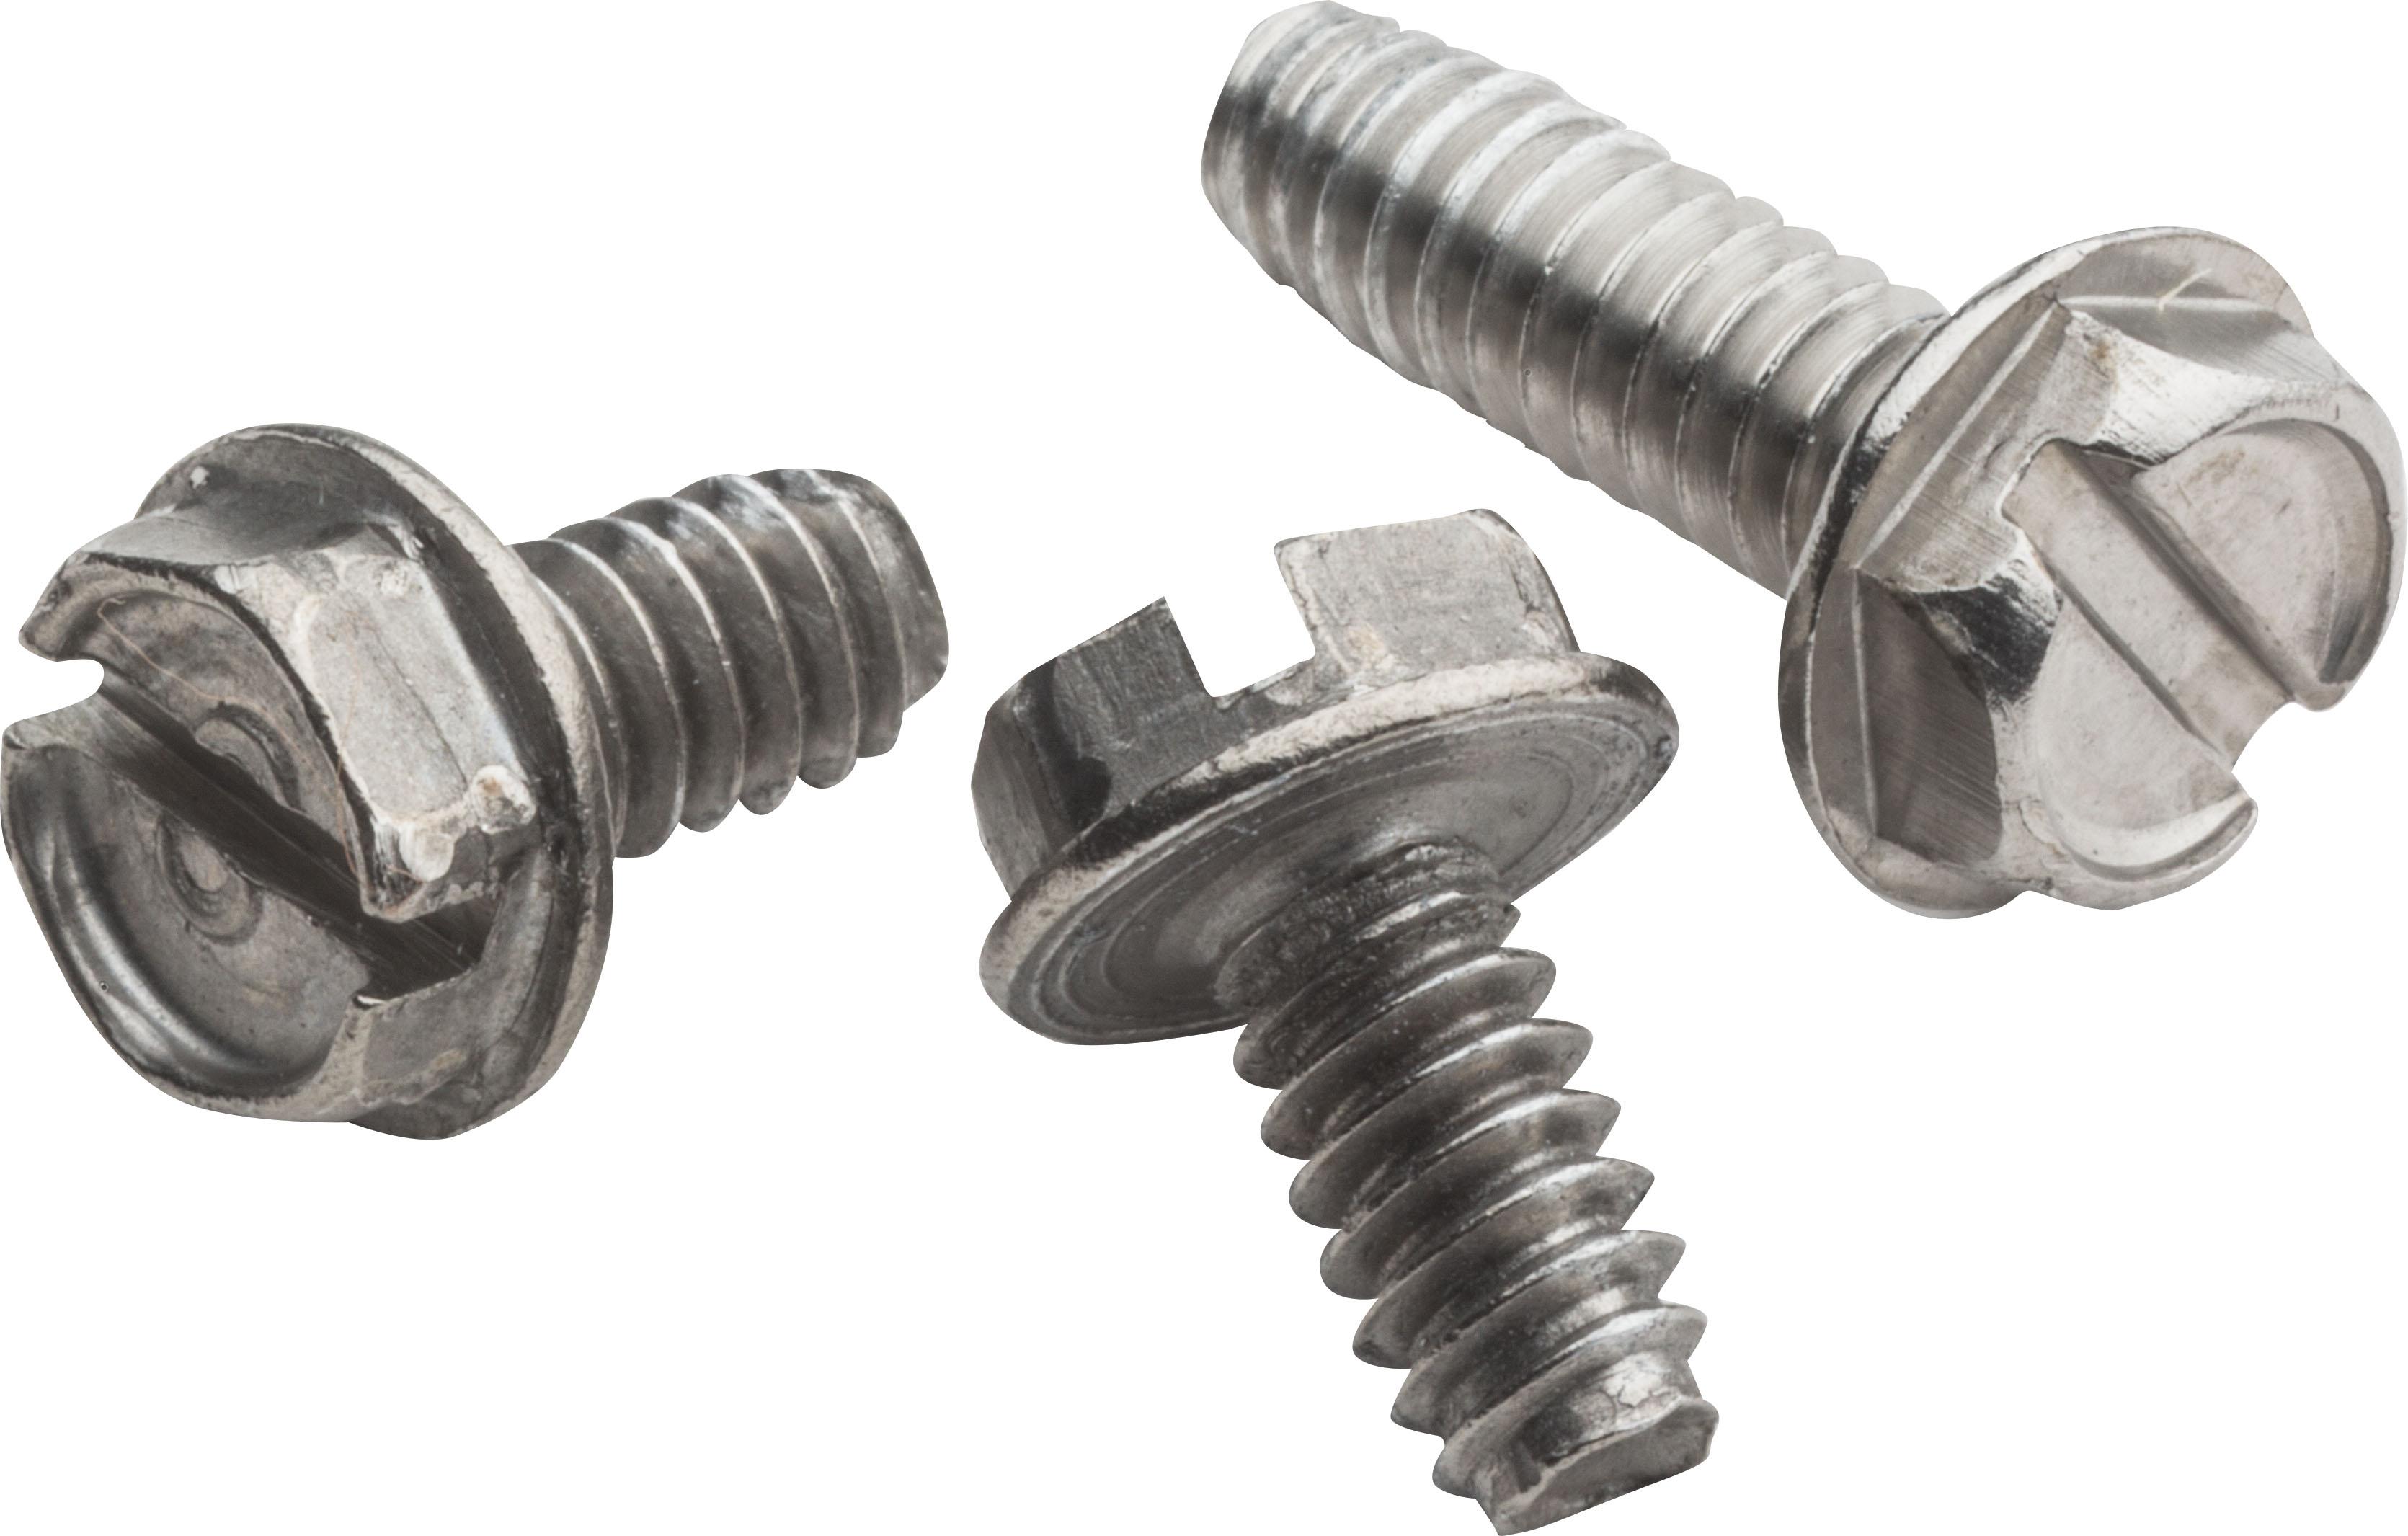 FEX_Stainless Steel Fasteners.jpg